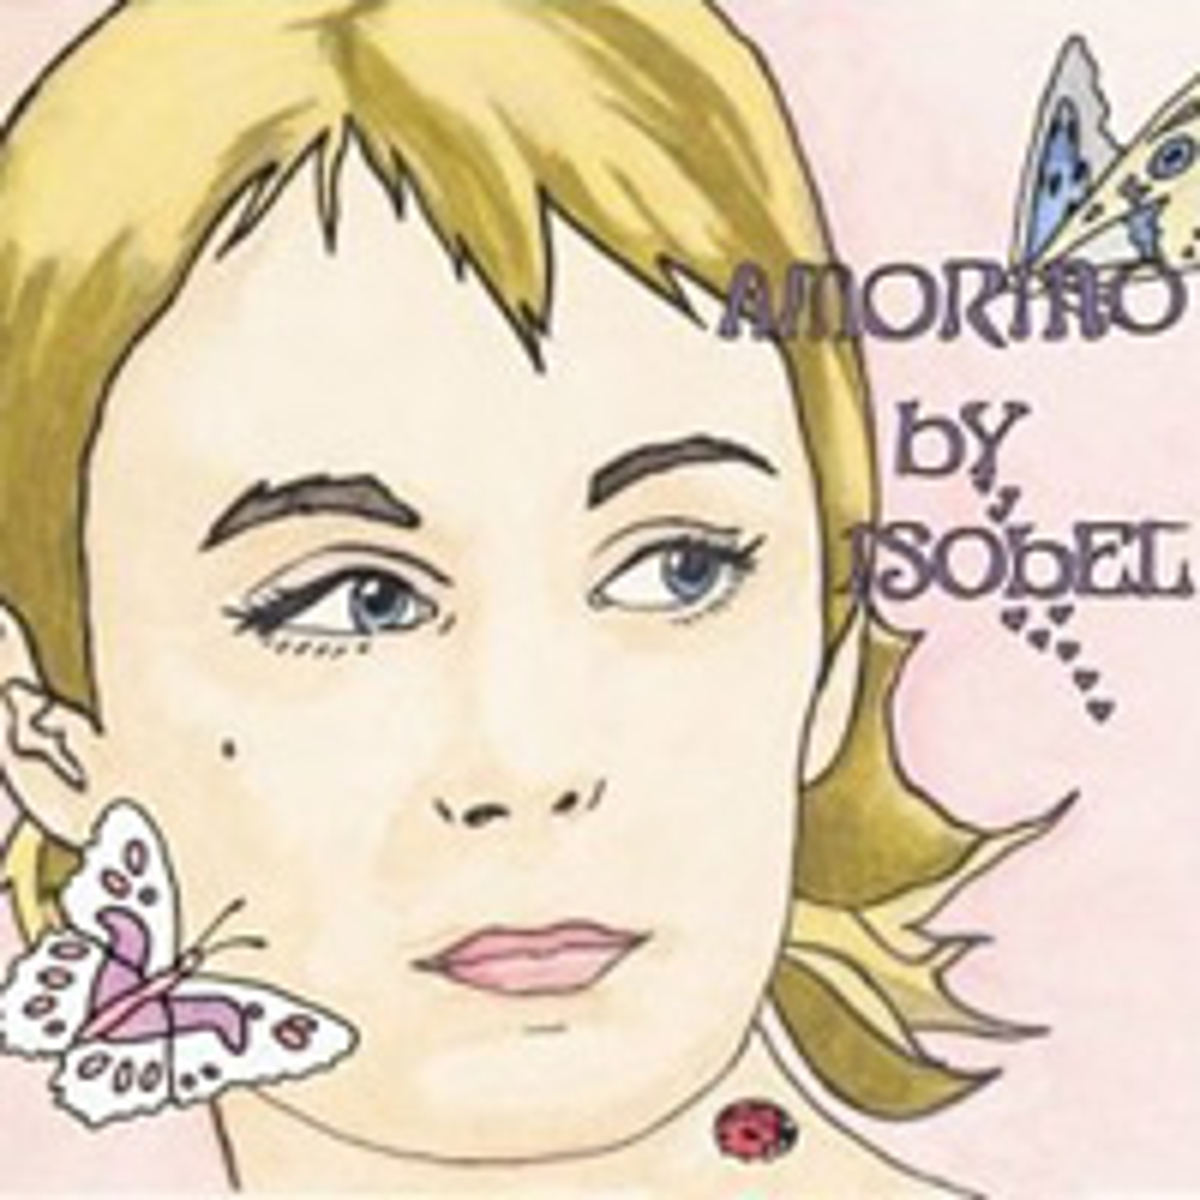 Isobel Campbell, Amorino